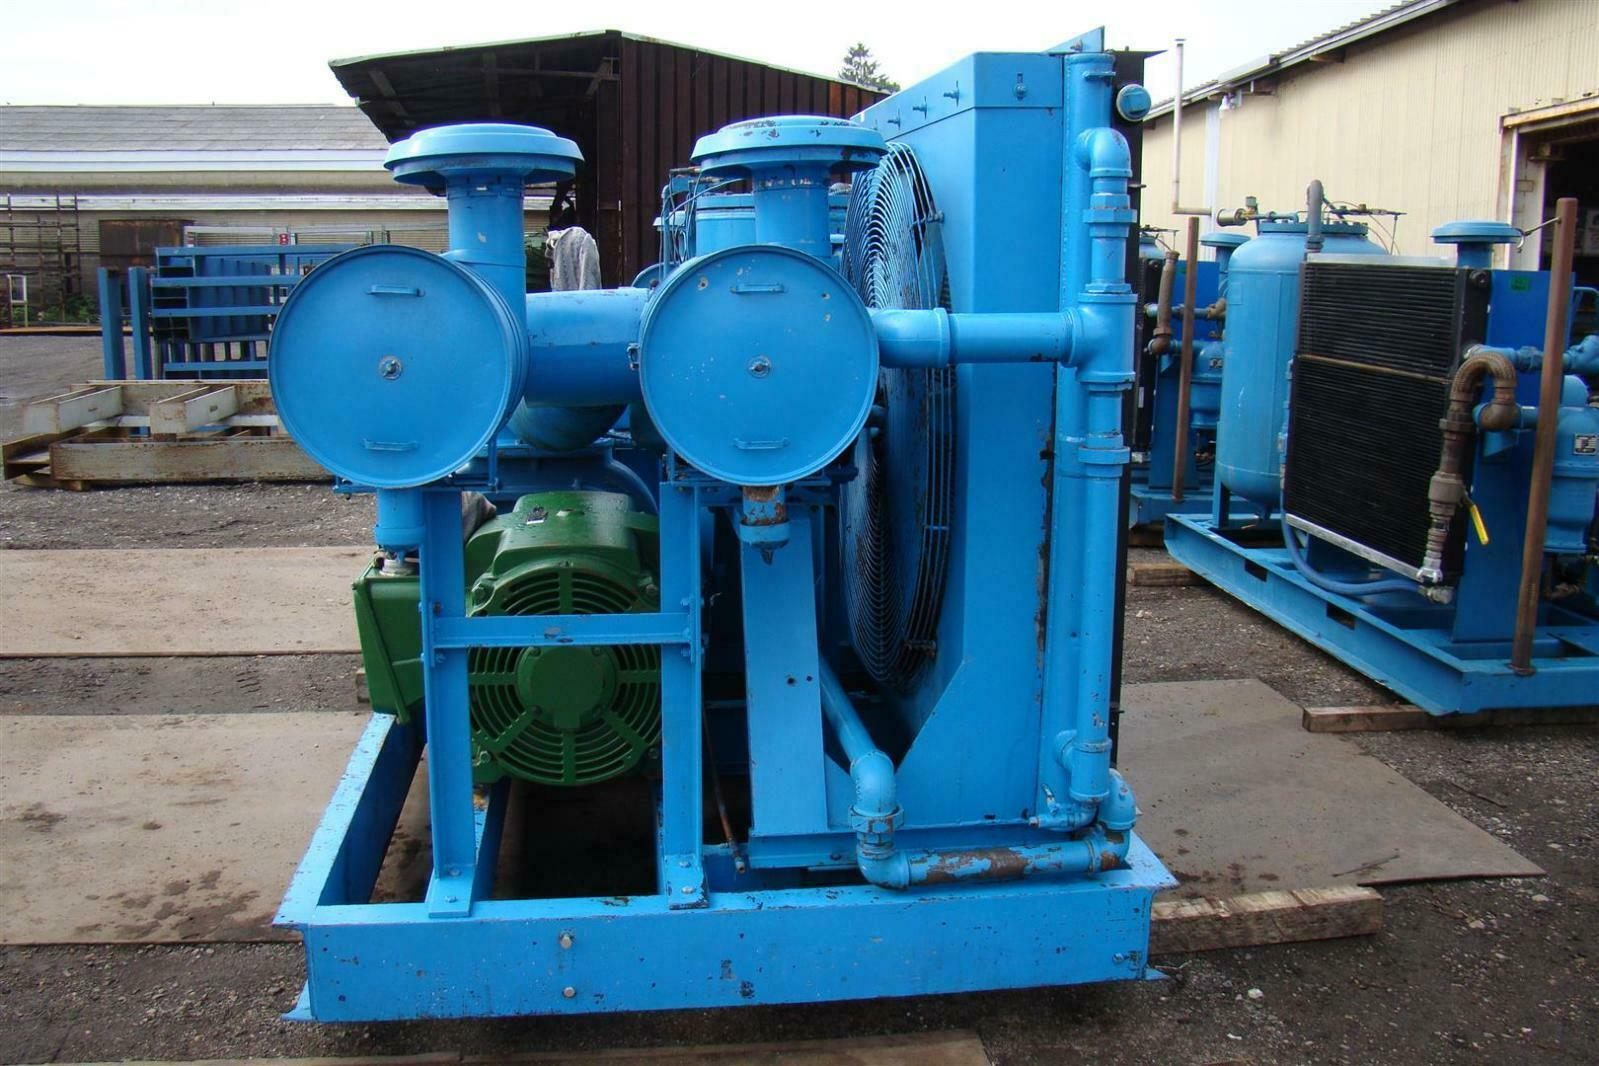 300hp Quincy Rotary Screw Air Compressor 460v 23 000hrs